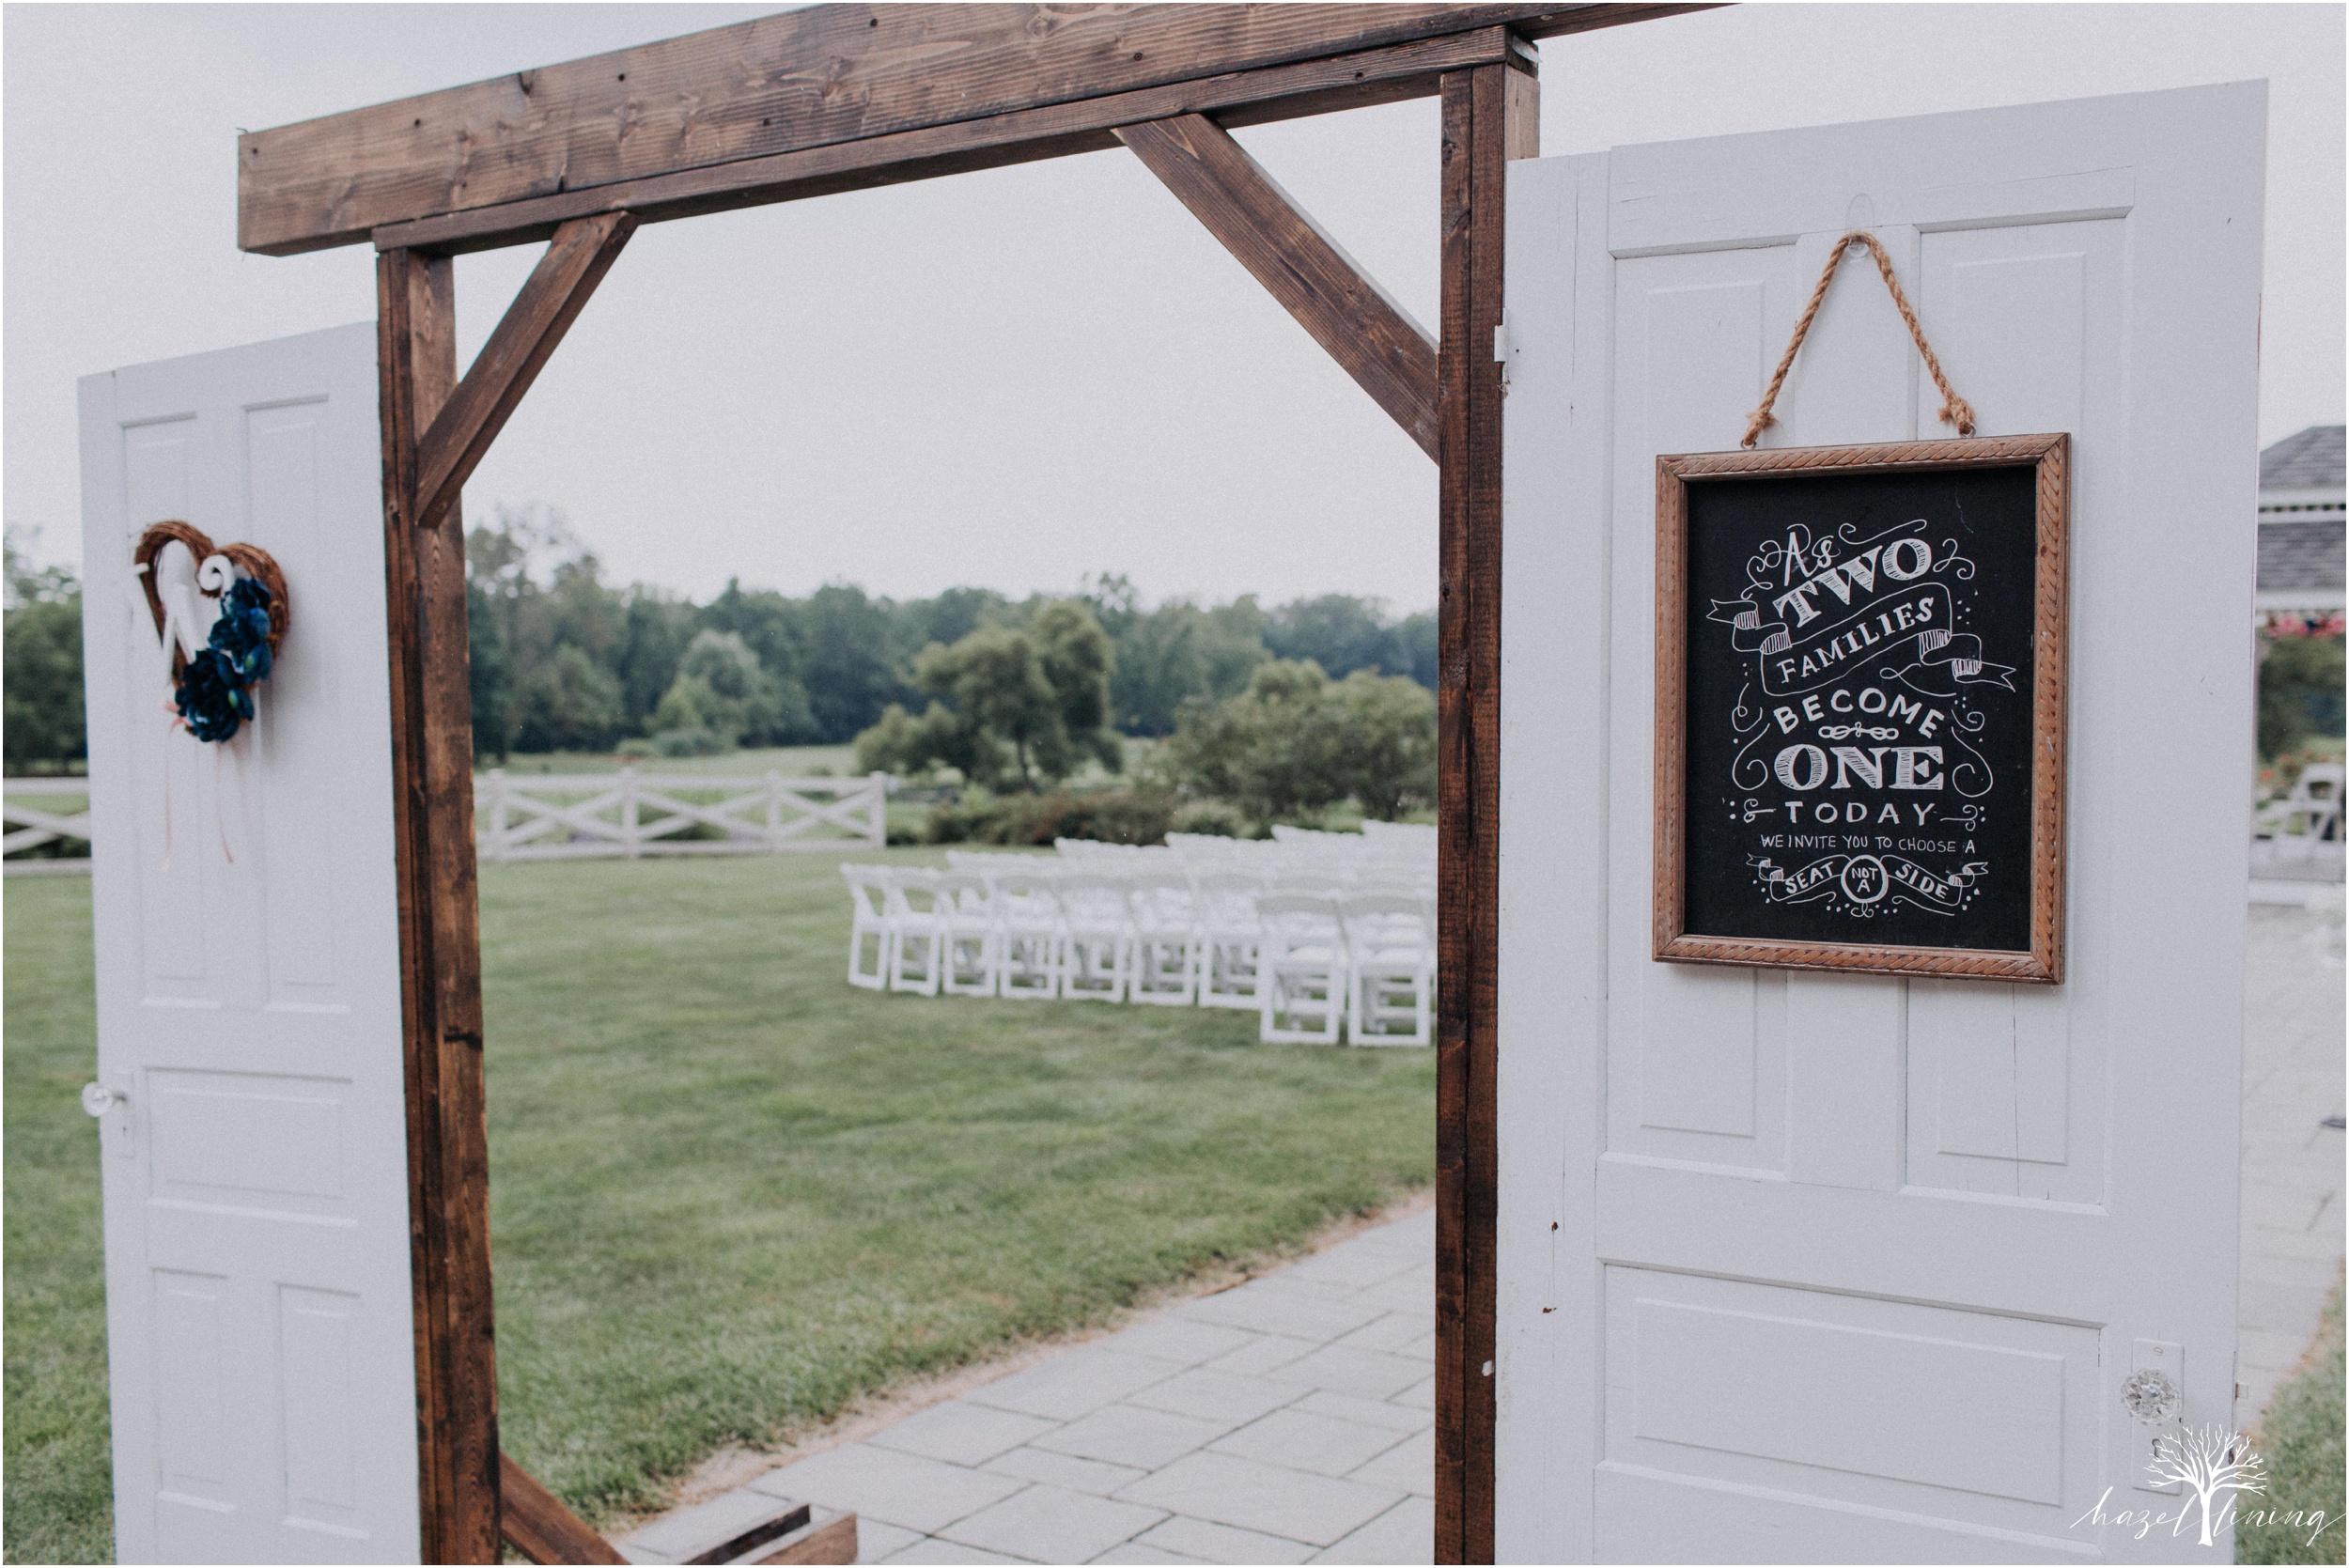 jonathan-weibel-becky-haywood-loft-at-sweetwater-cc-pennsburg-pennsylvania-rainy-day-summer-wedding-hazel-lining-travel-wedding-elopement-photography_0036.jpg